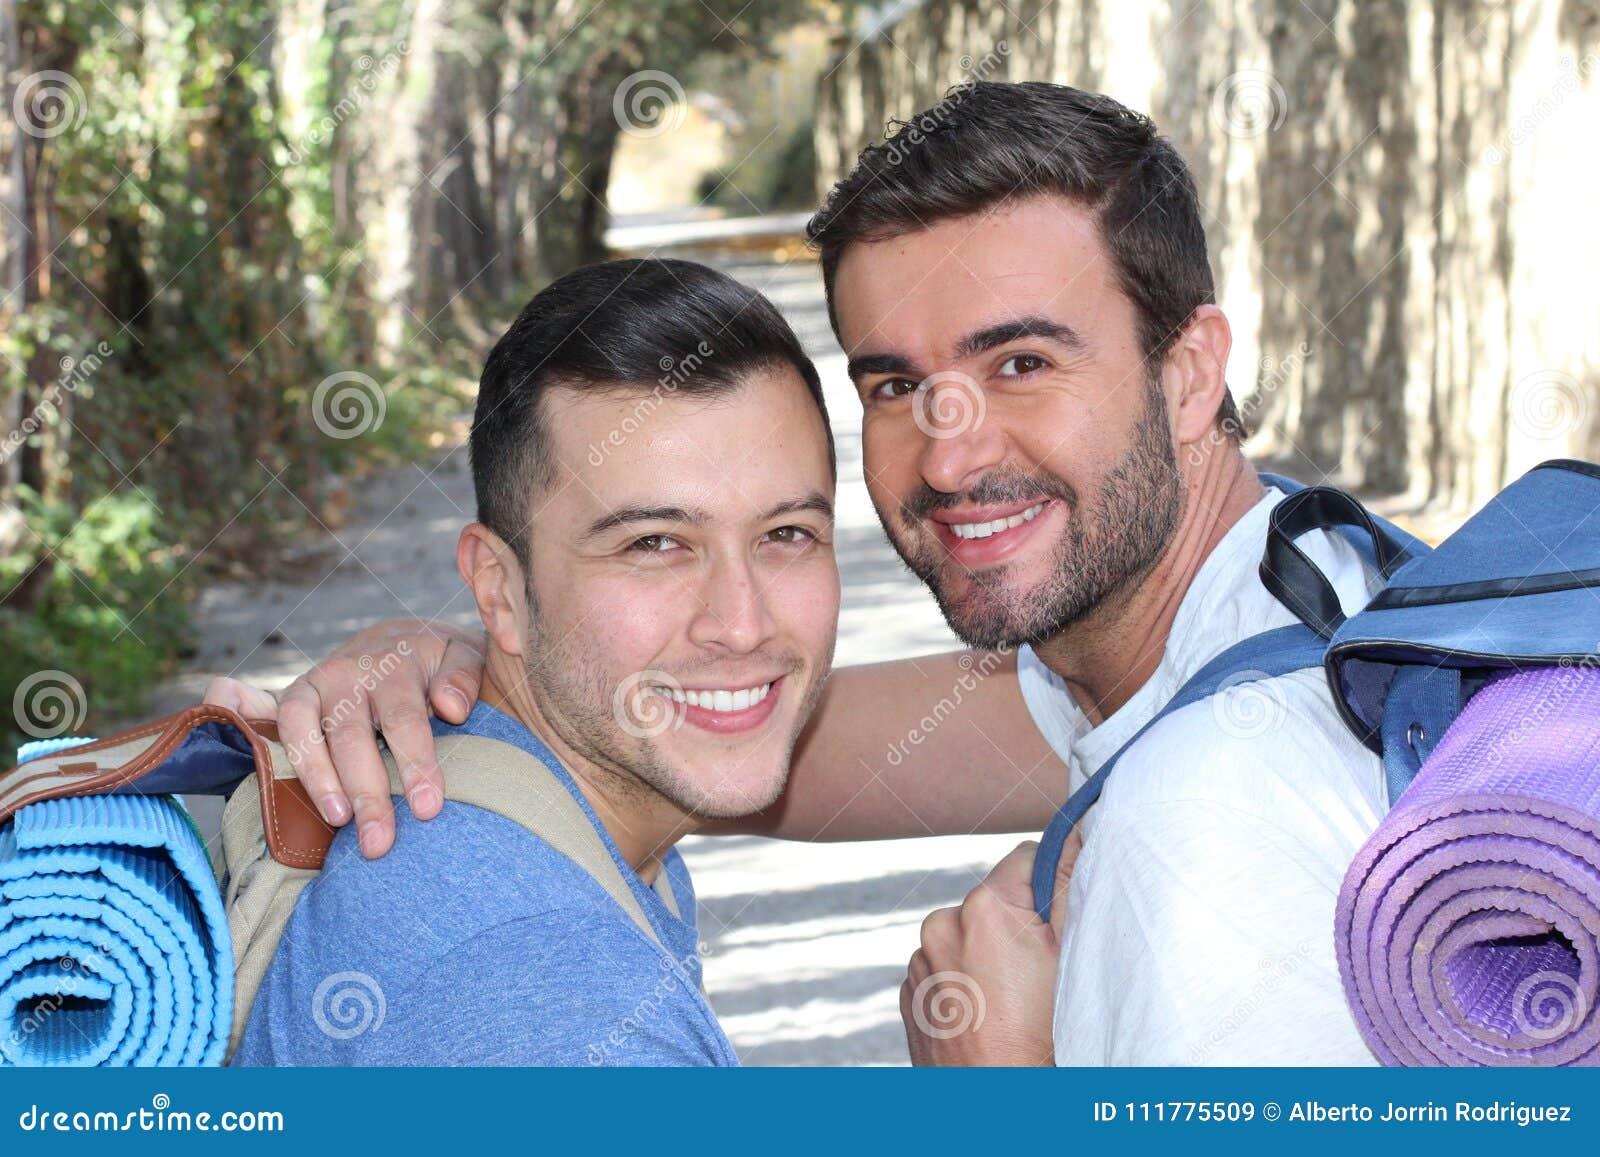 Gay couple enjoying a hike